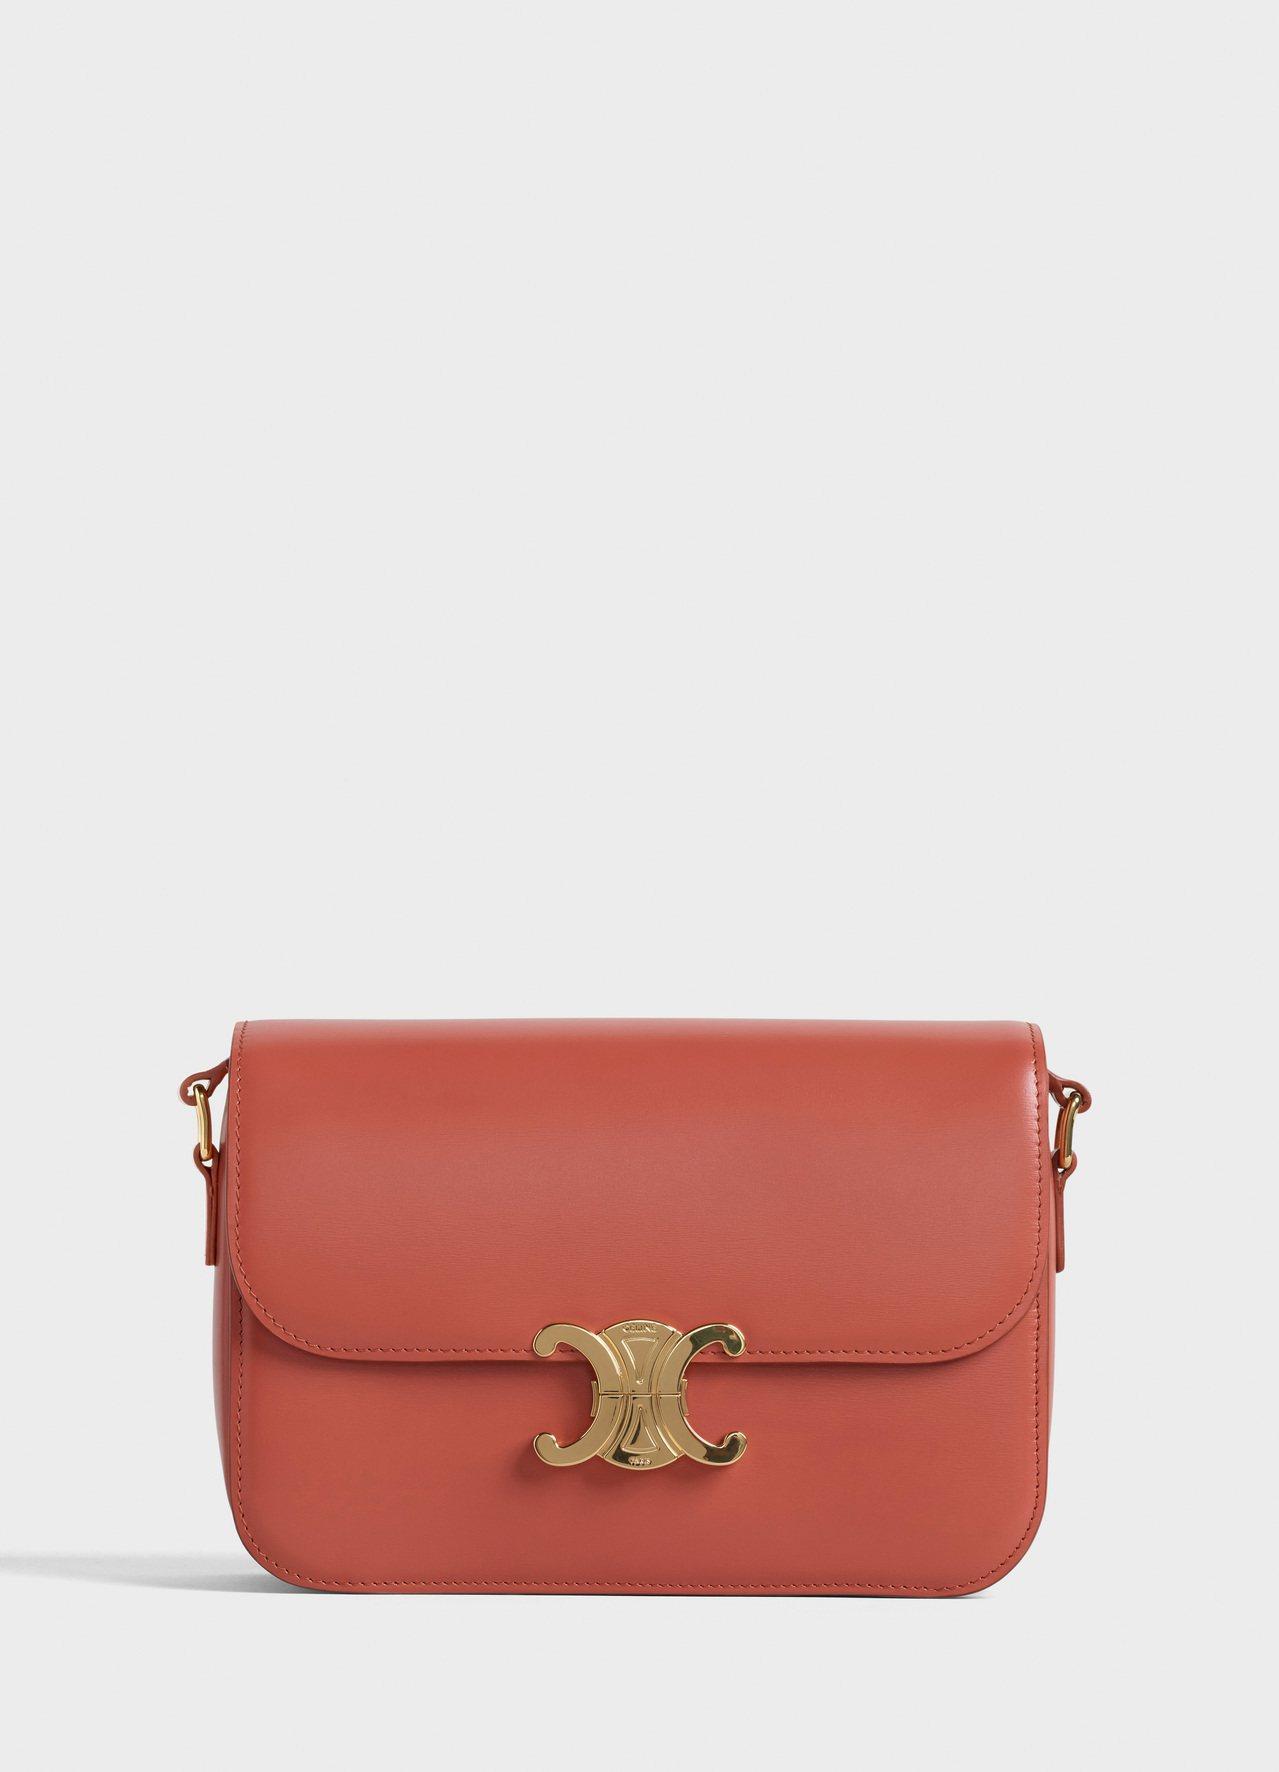 Triomphe陶瓦紅小牛皮中型肩背包,售價11萬5,000元。圖/CELINE...